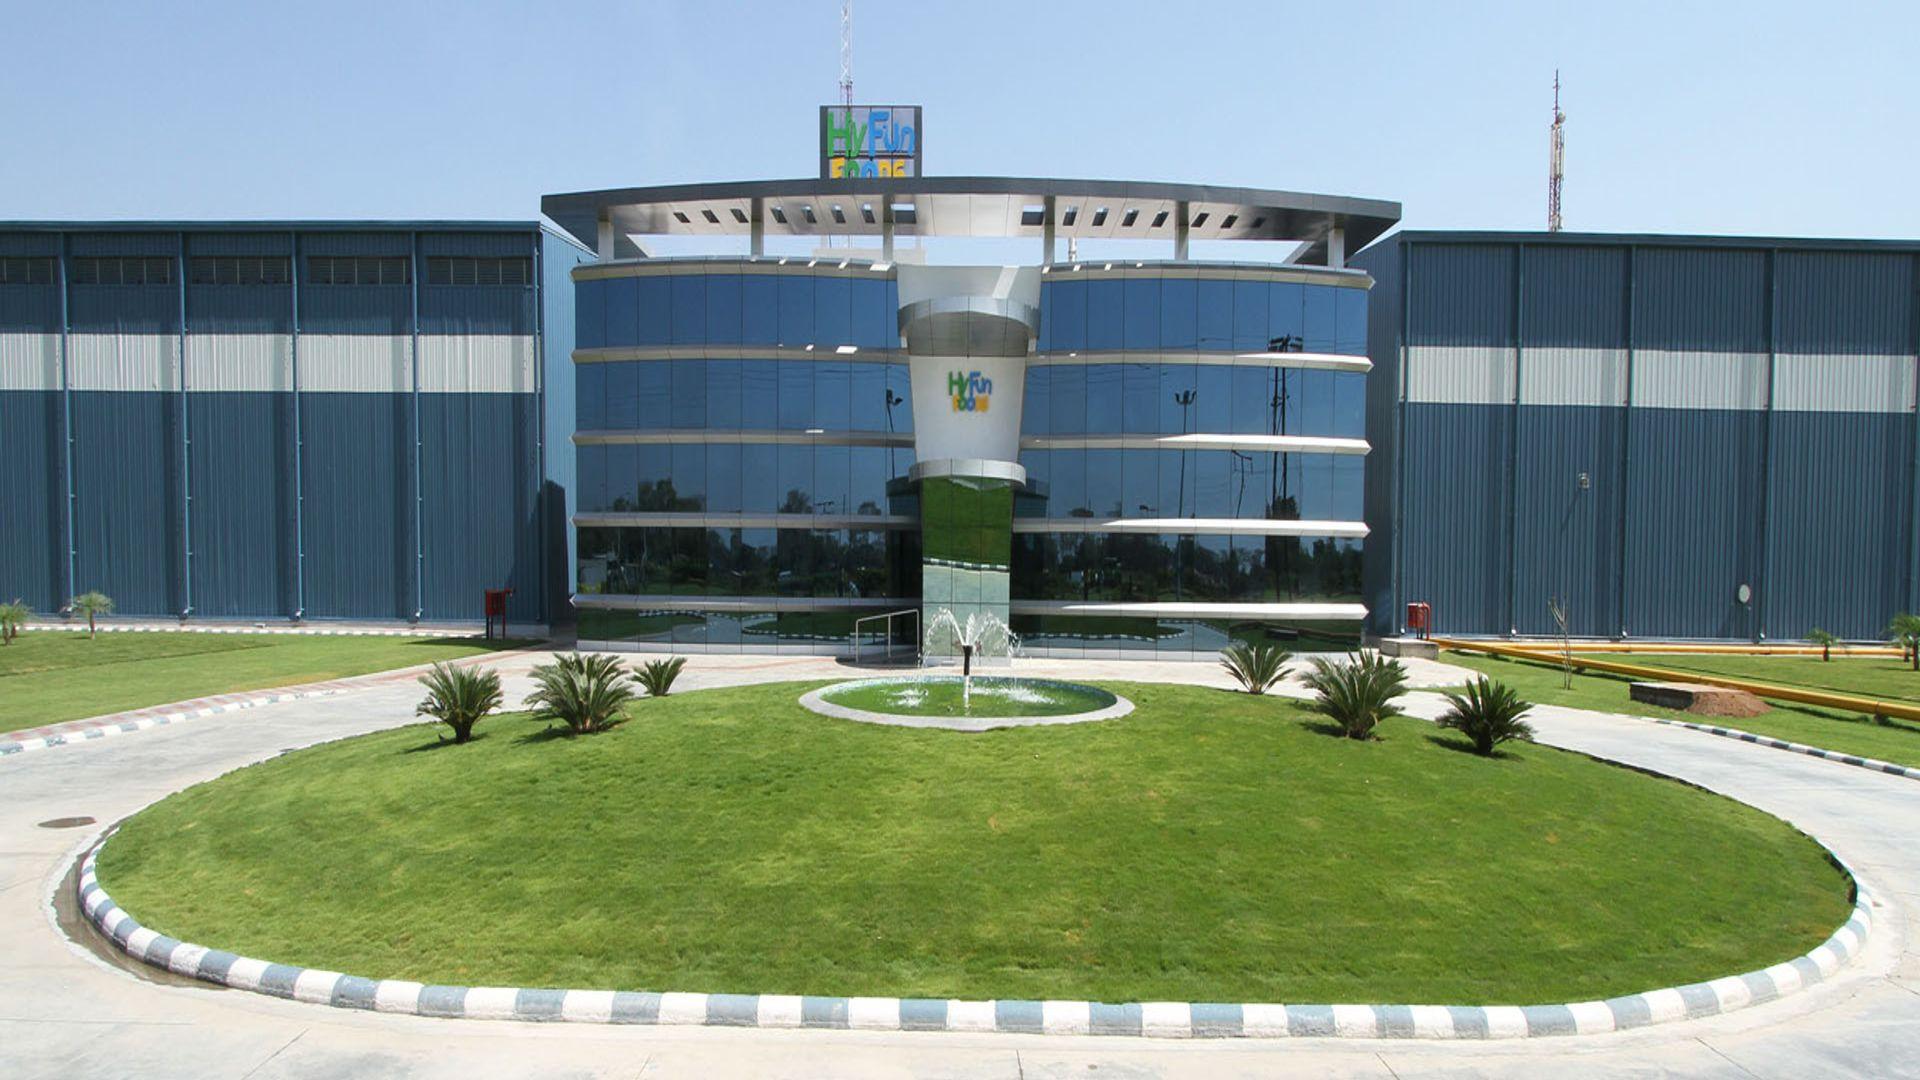 Hyfun Frozen Food-Agro & Food Processing Industries 1